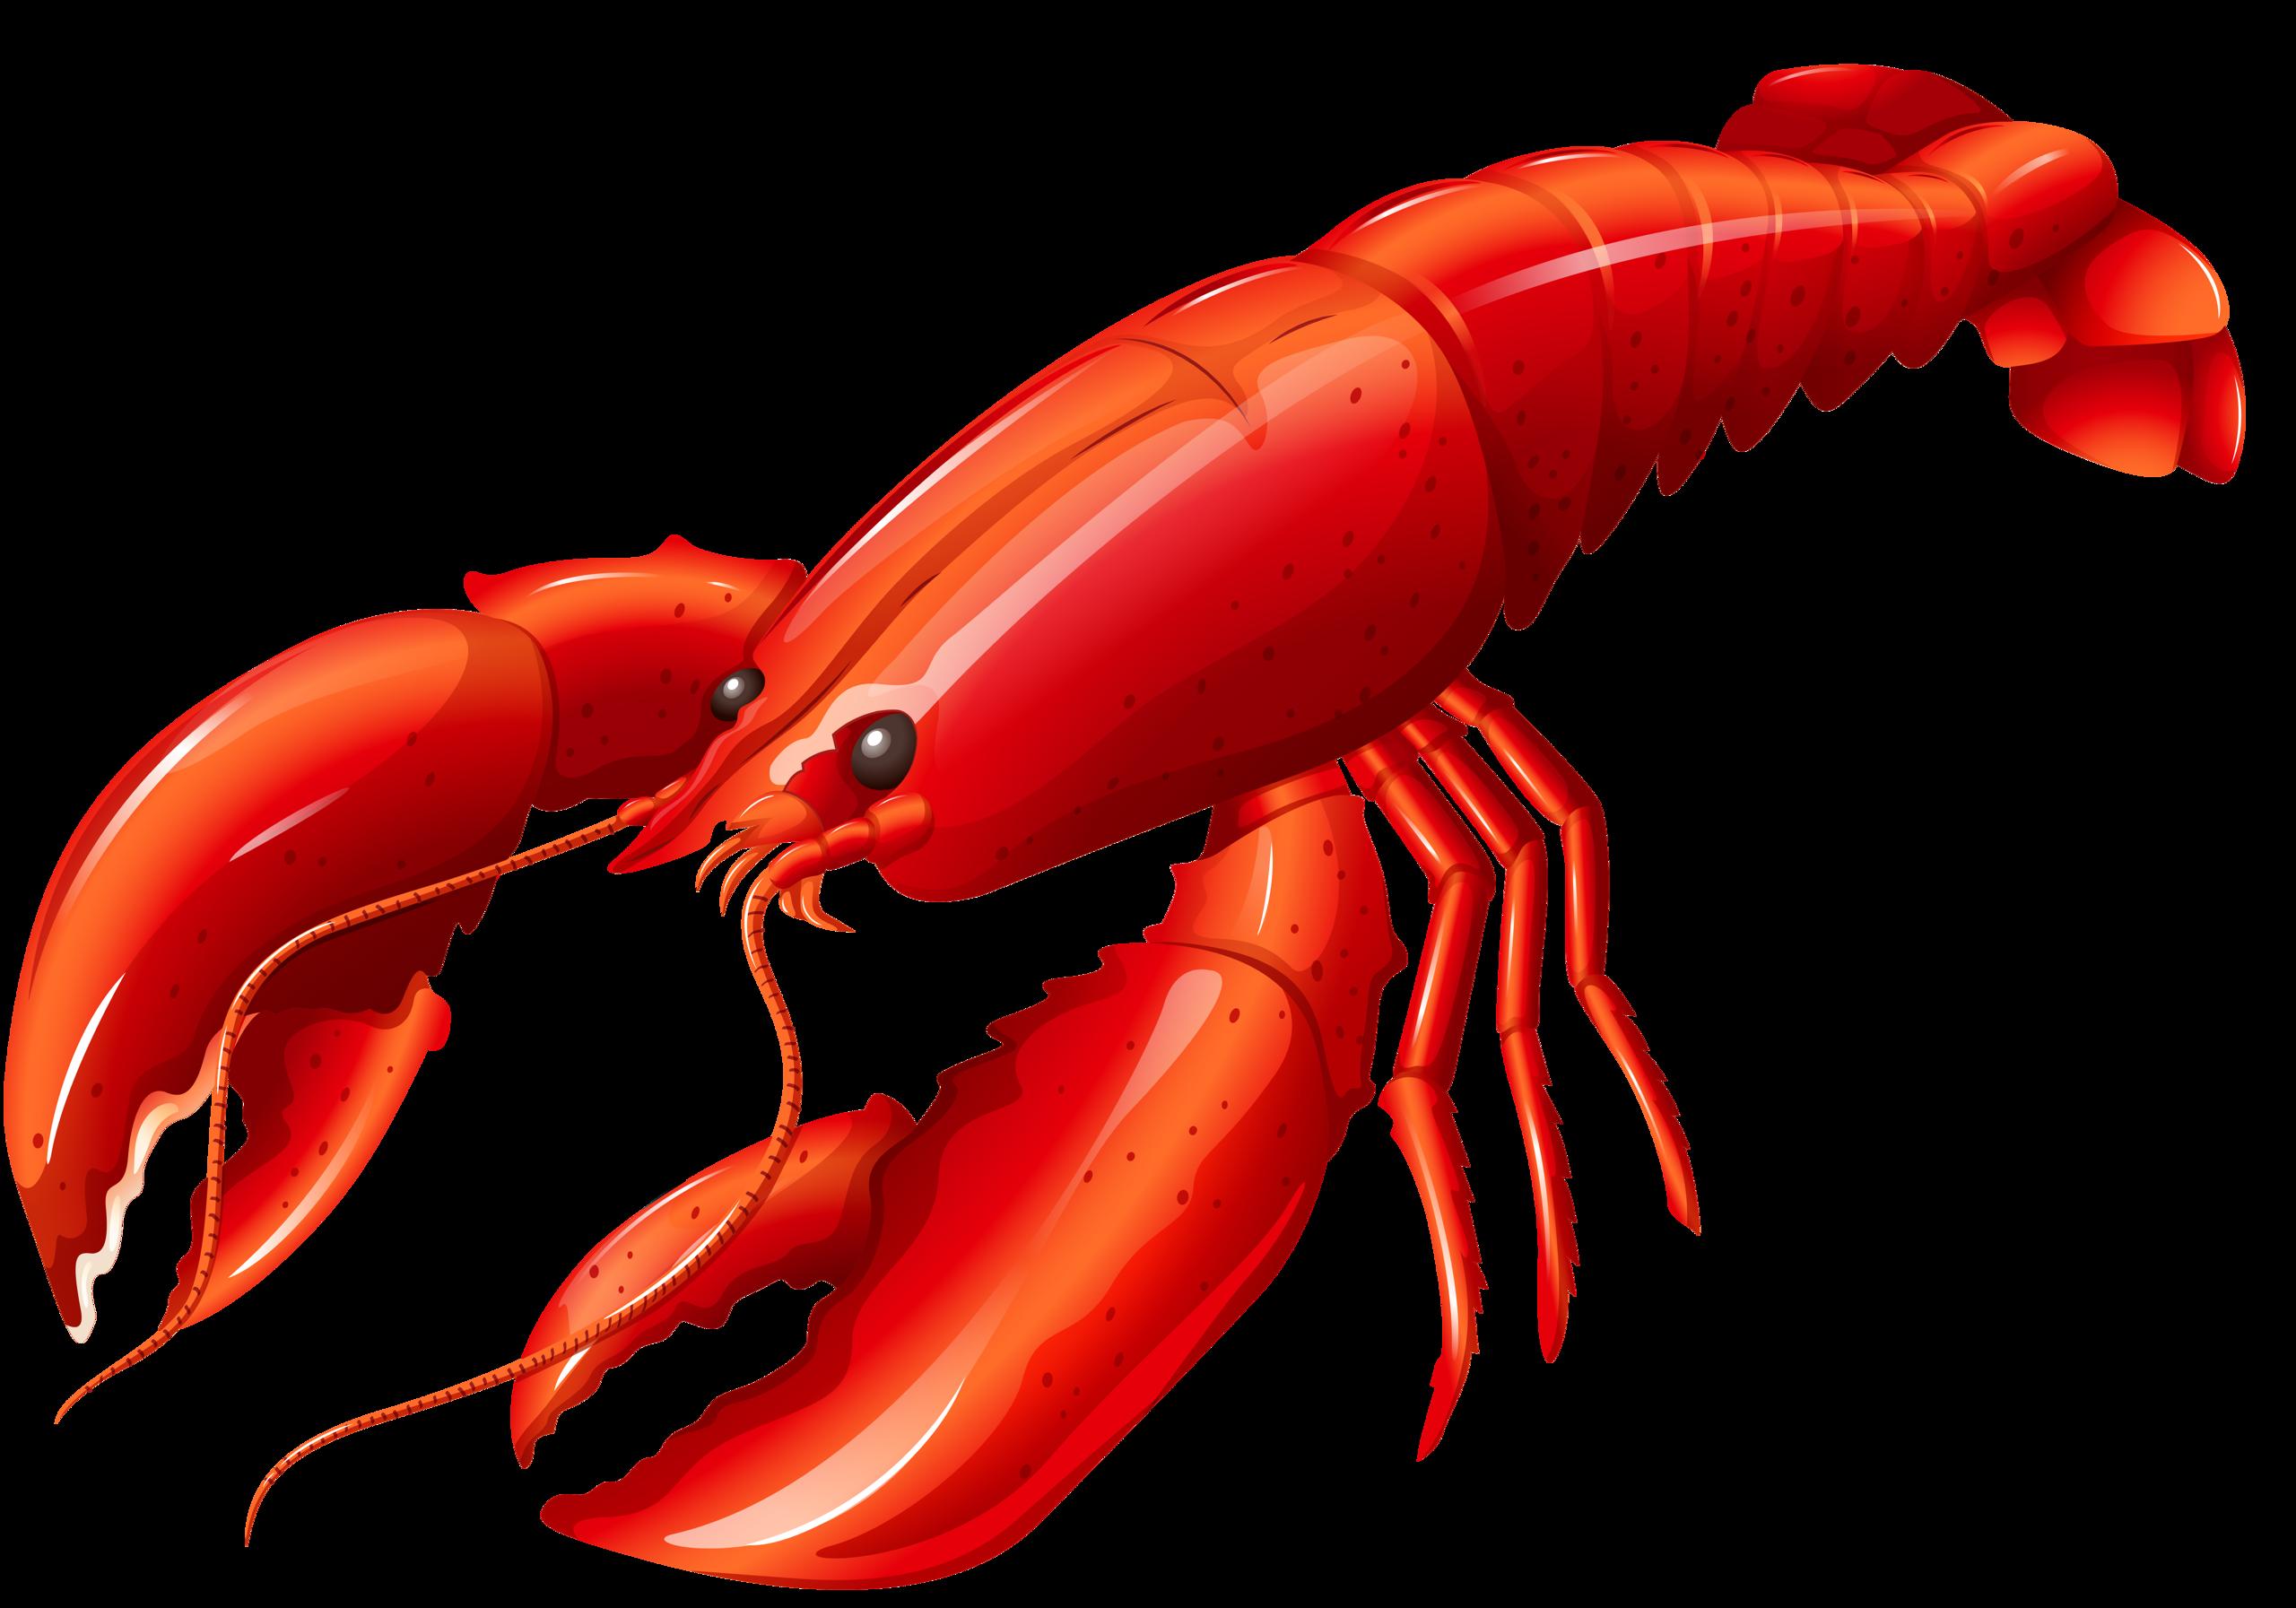 Crawfish clipart animated gif. Crayfish at getdrawings com